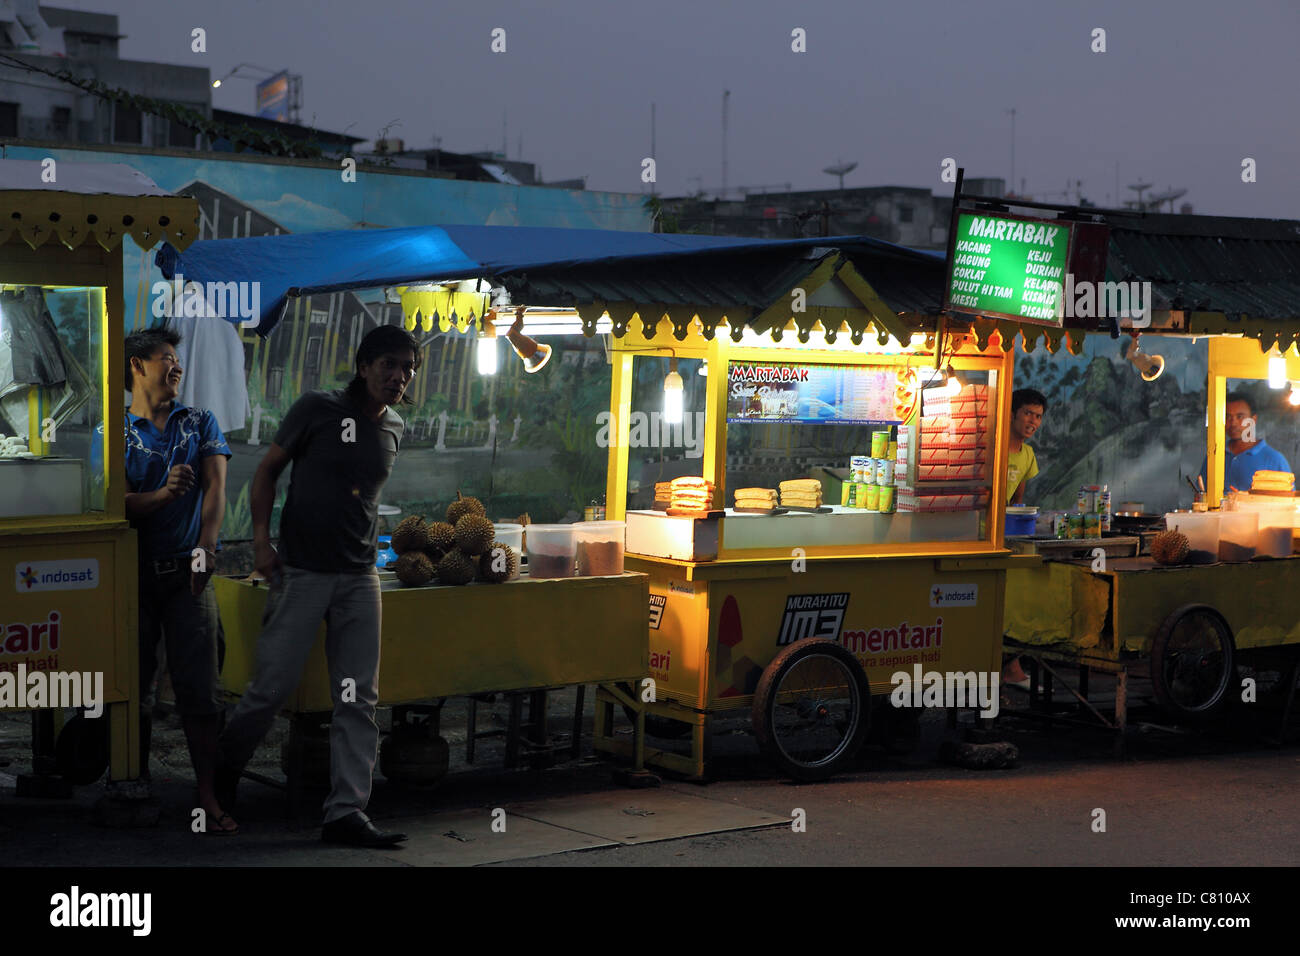 Street food carts at dusk in Pekanbaru - Stock Image